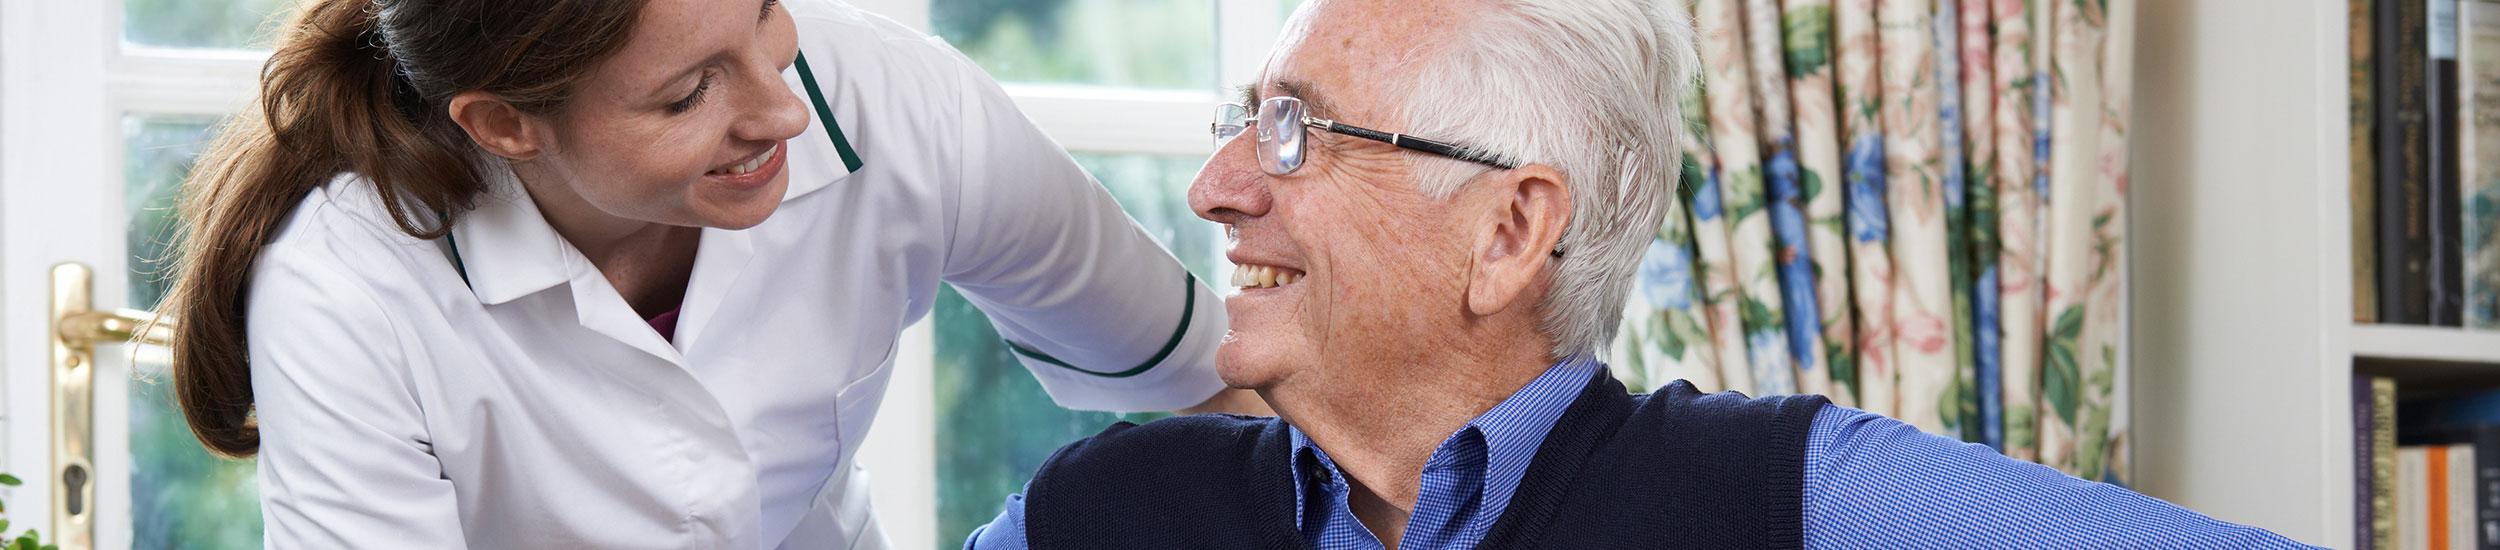 seniorenbetreuung-zu-hause